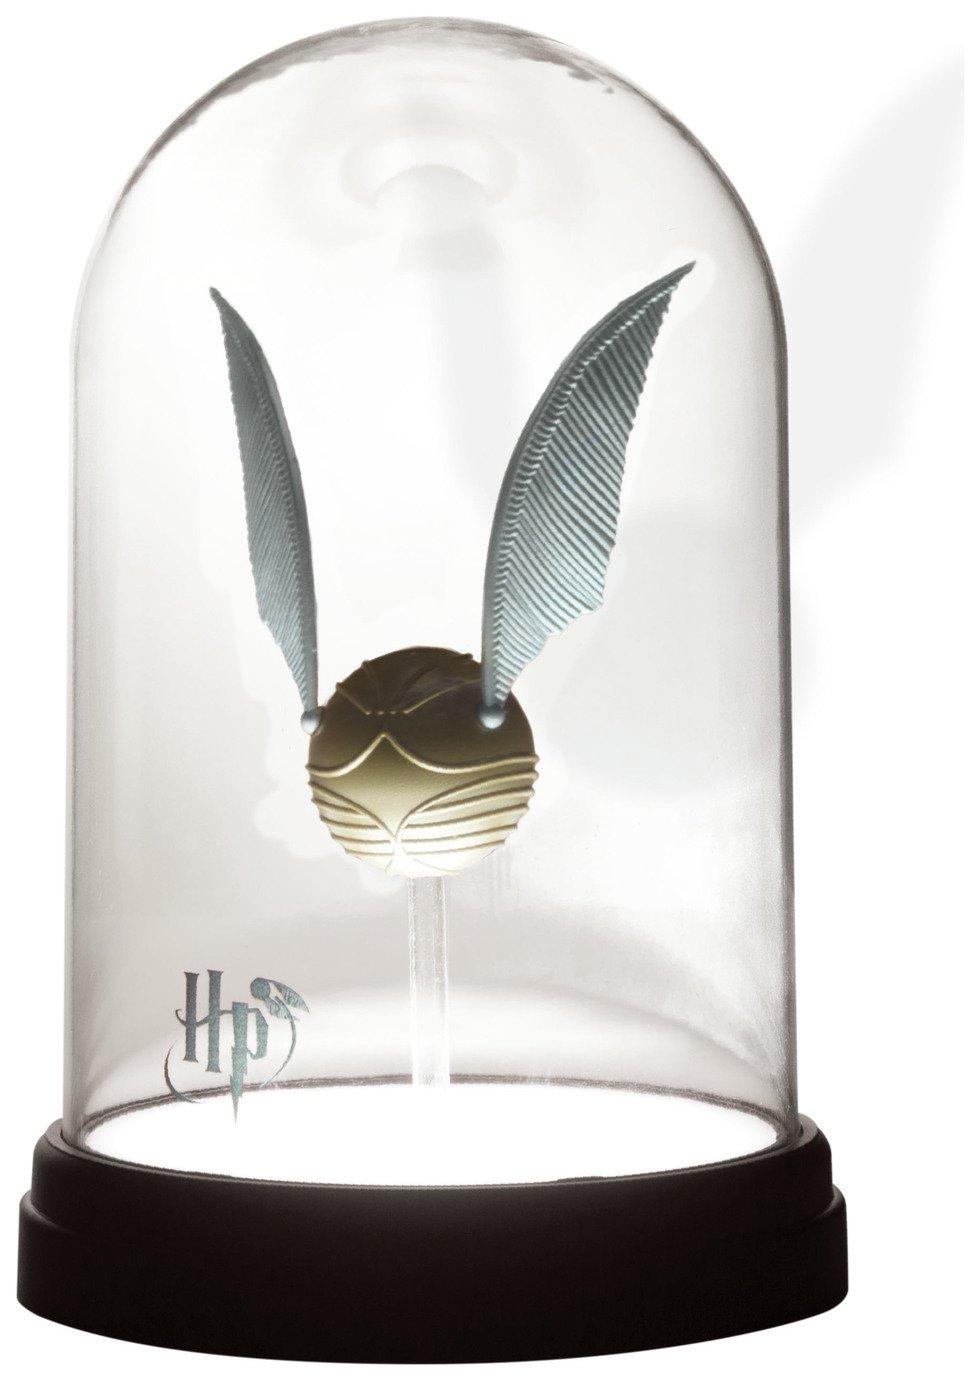 Harry Potter Golden Snitch Jar